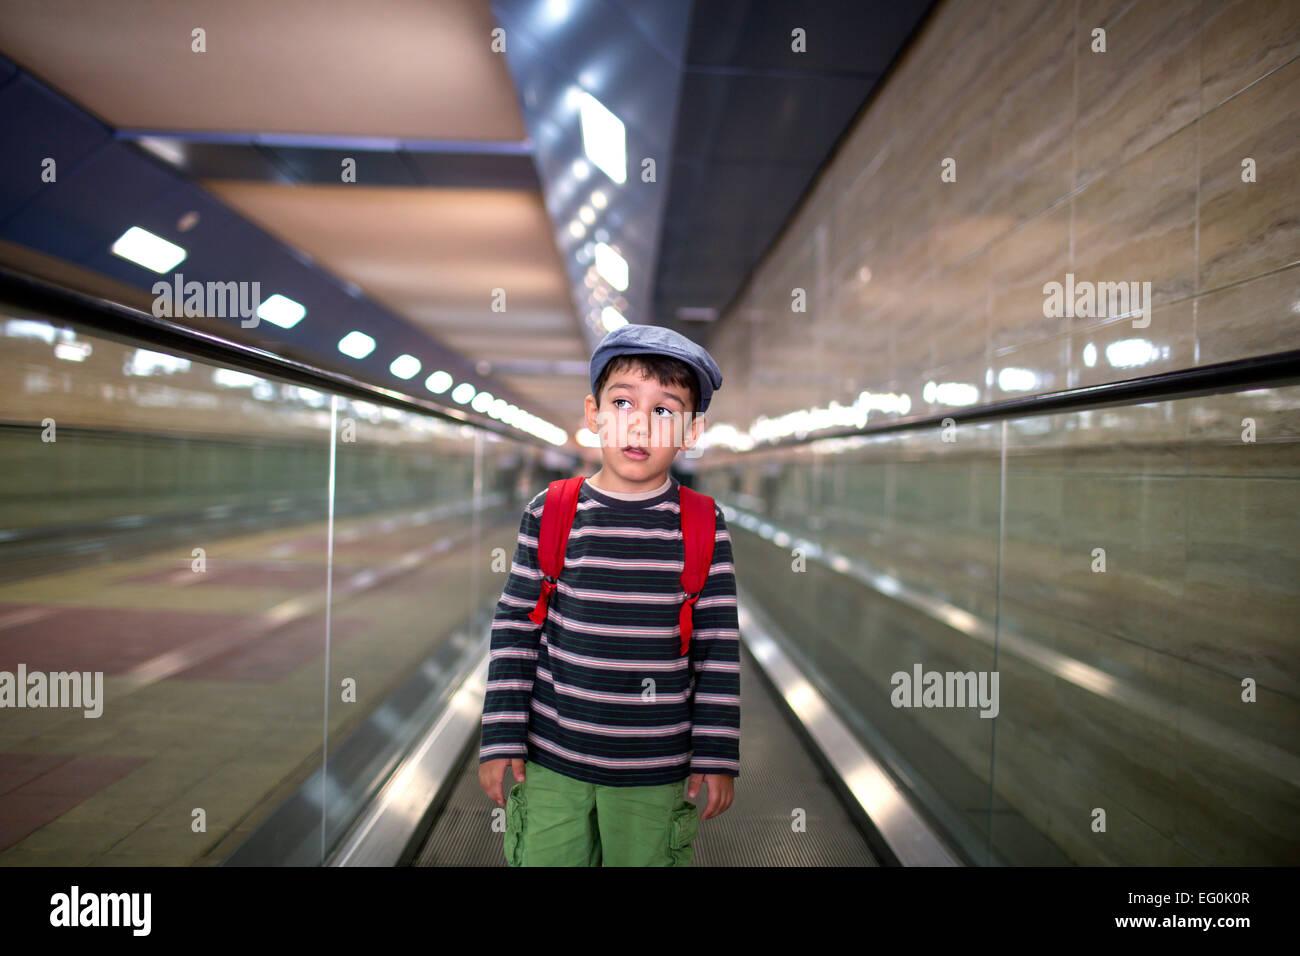 Bulgaria, Sofia, Boy (4-5) standing on escalator - Stock Image